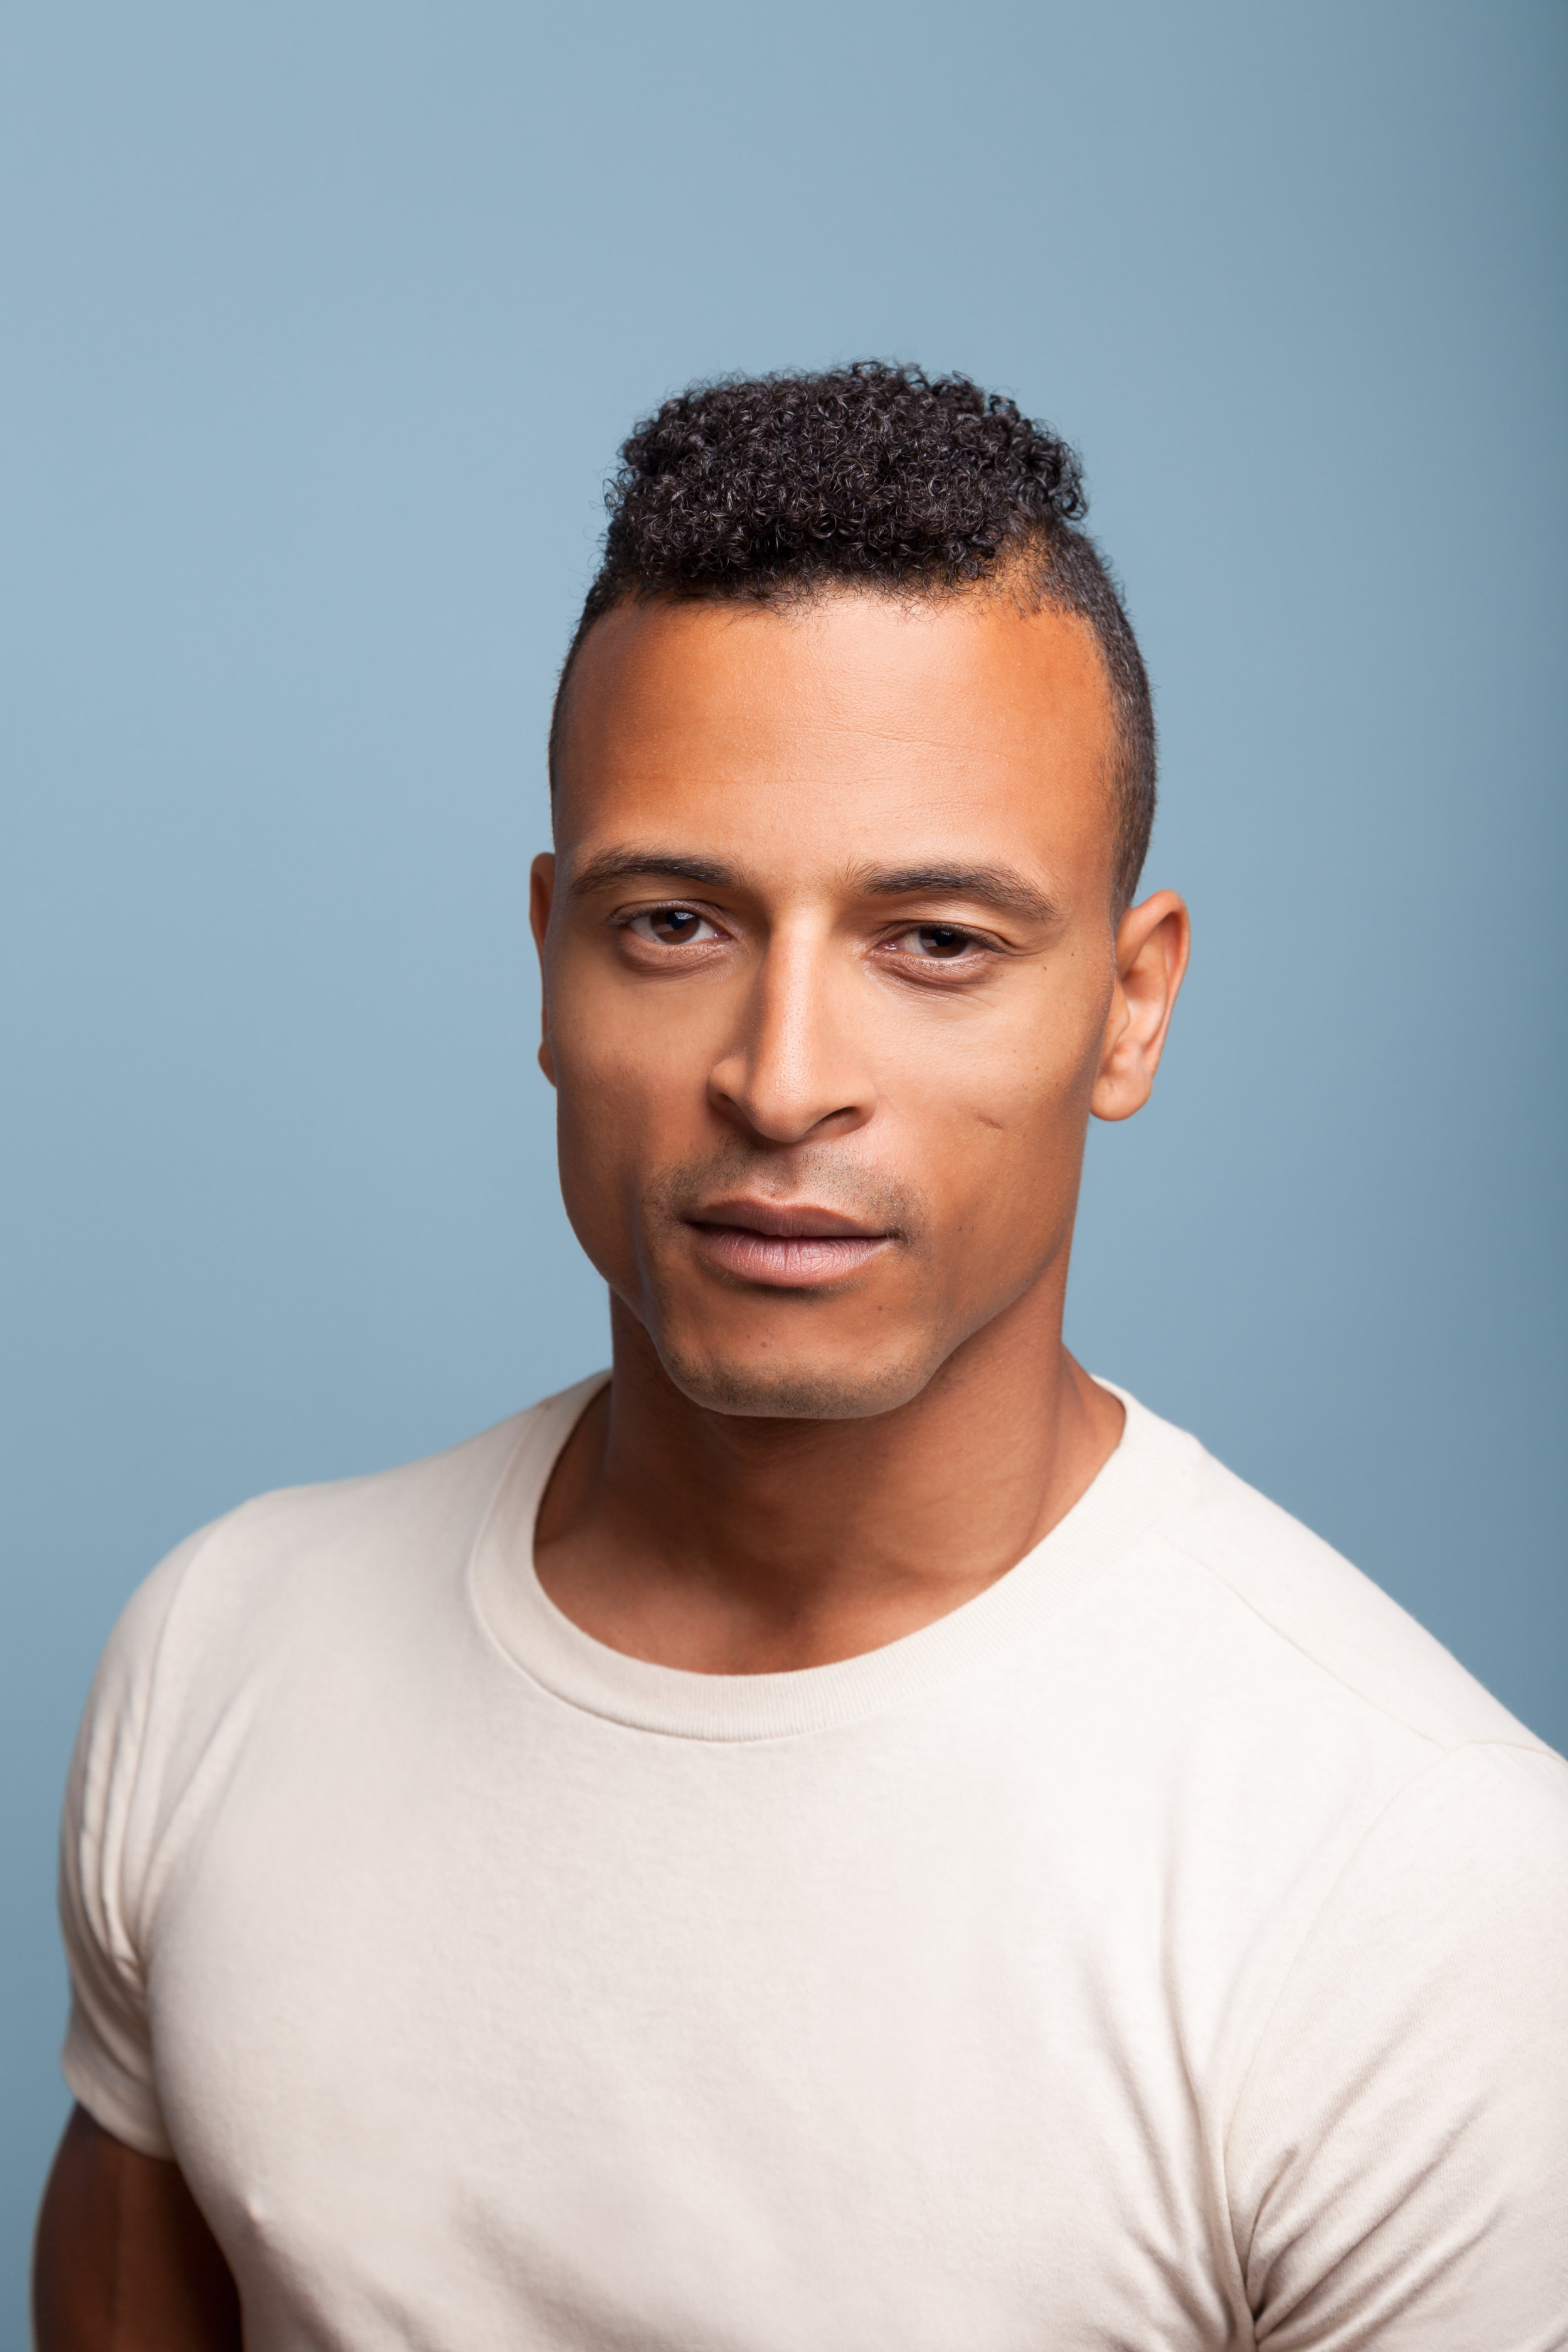 Bryan Michael King - Actor, Model